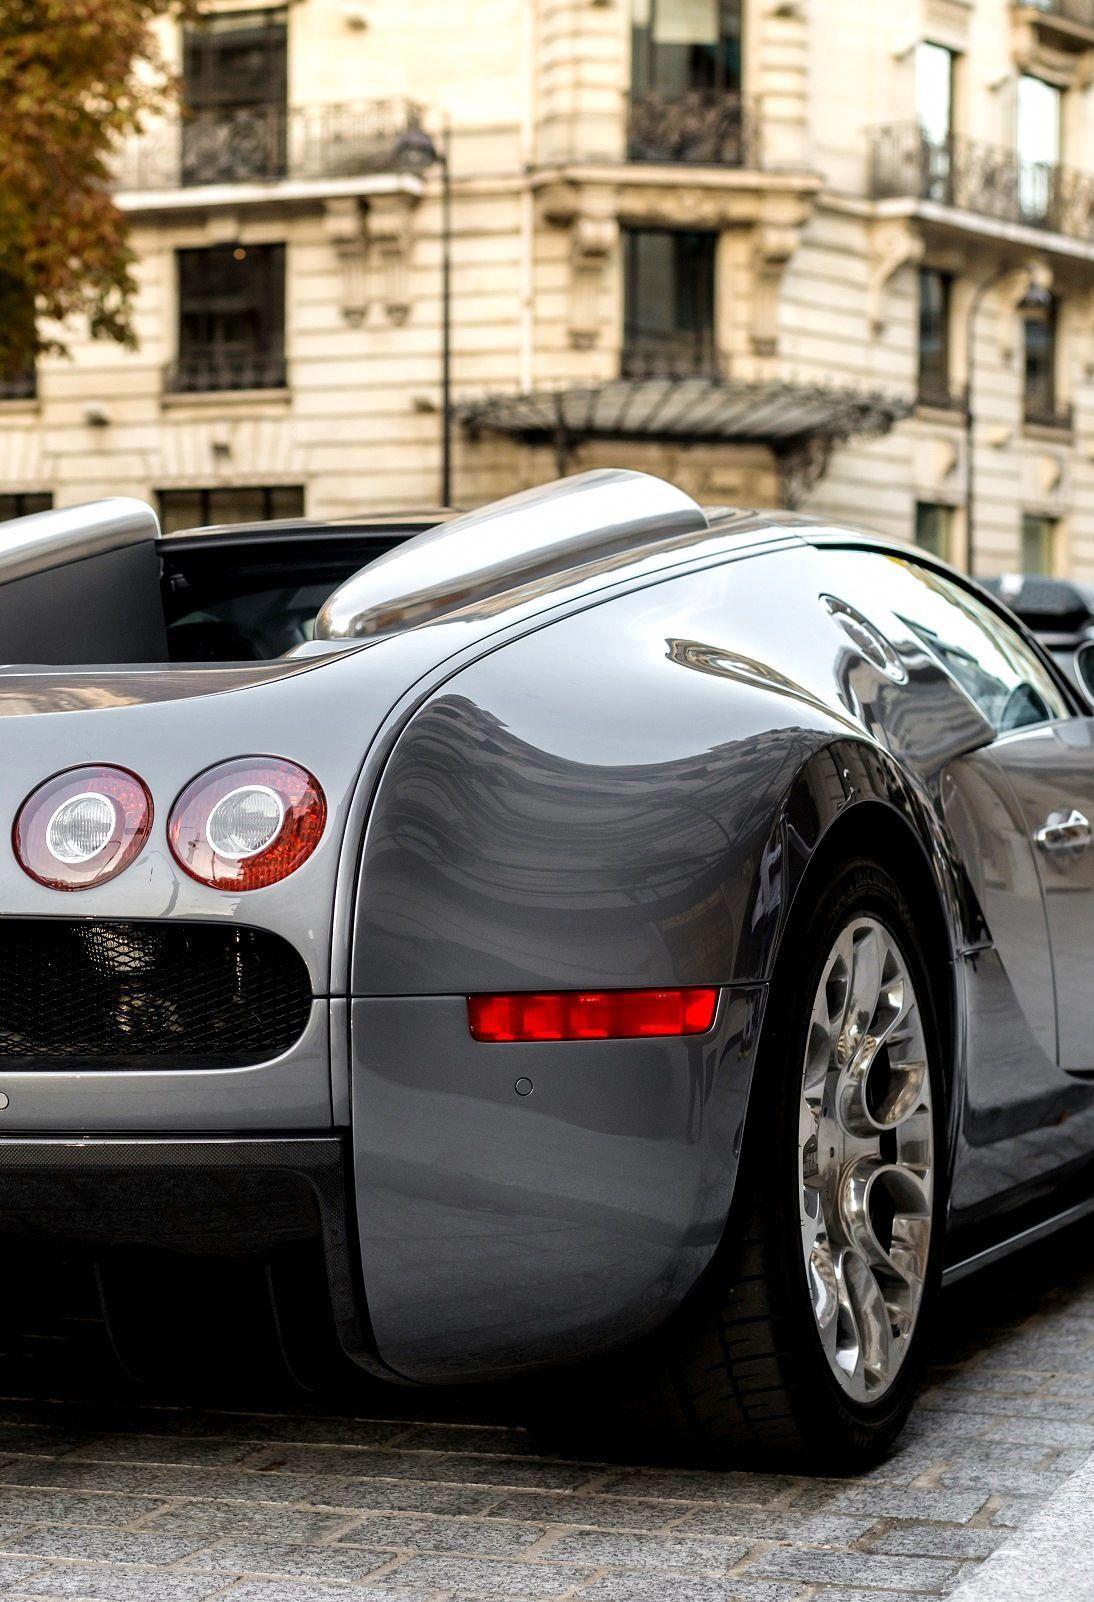 Bugatti Veyron See more sports car pics at www